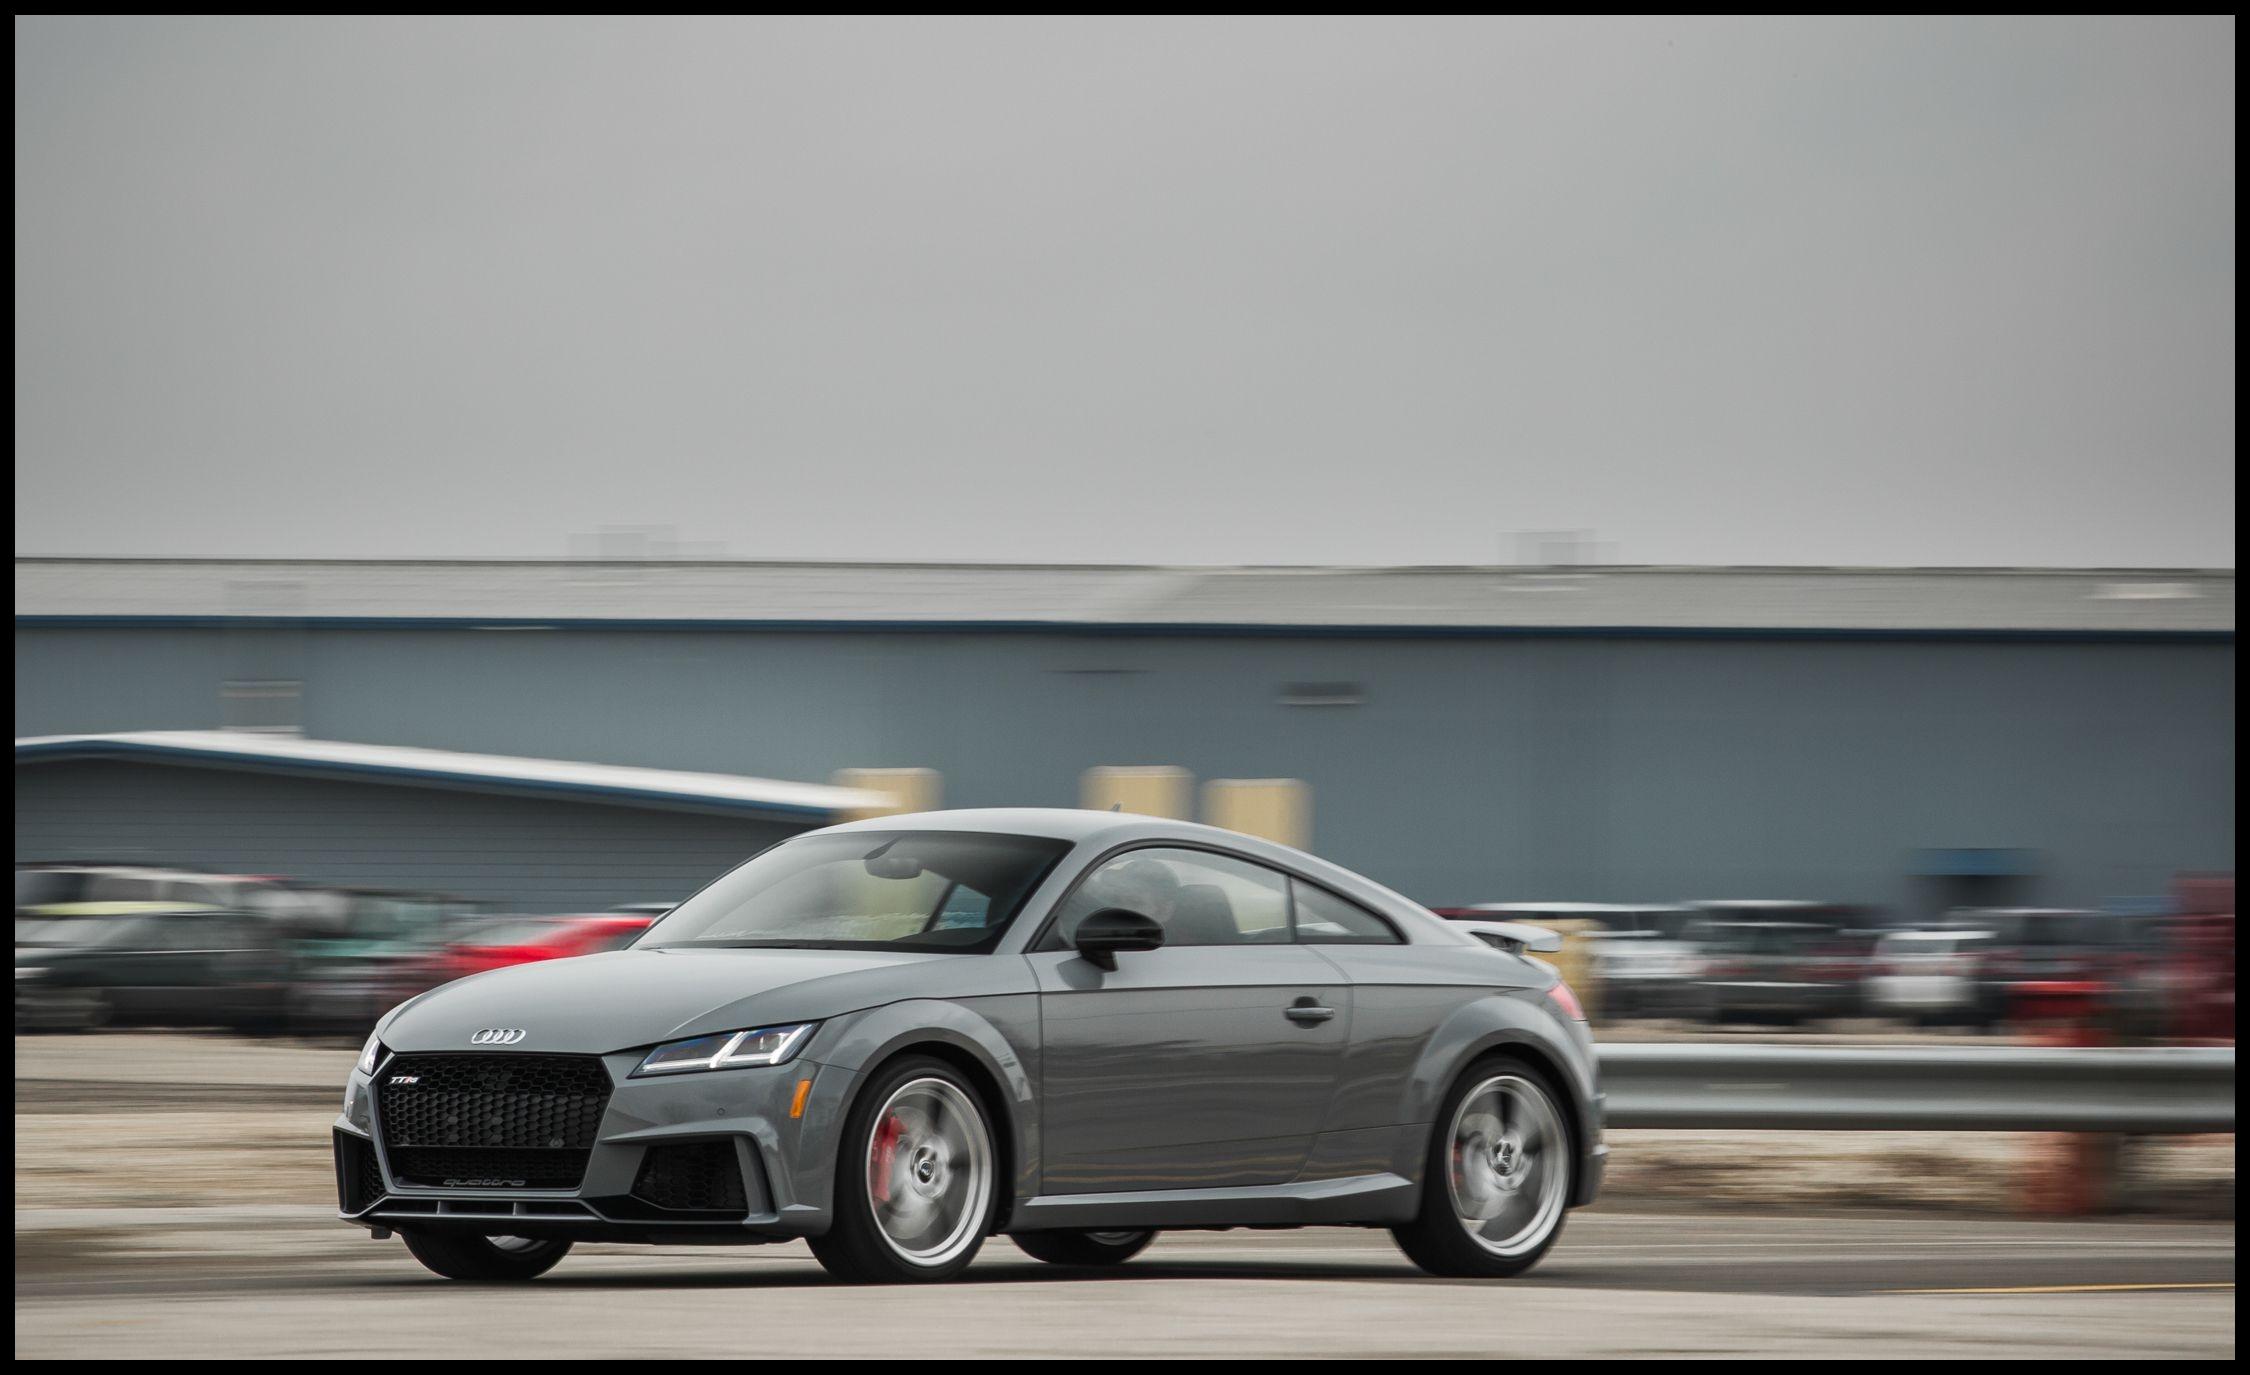 Audi TT RS Reviews Audi TT RS Price s and Specs